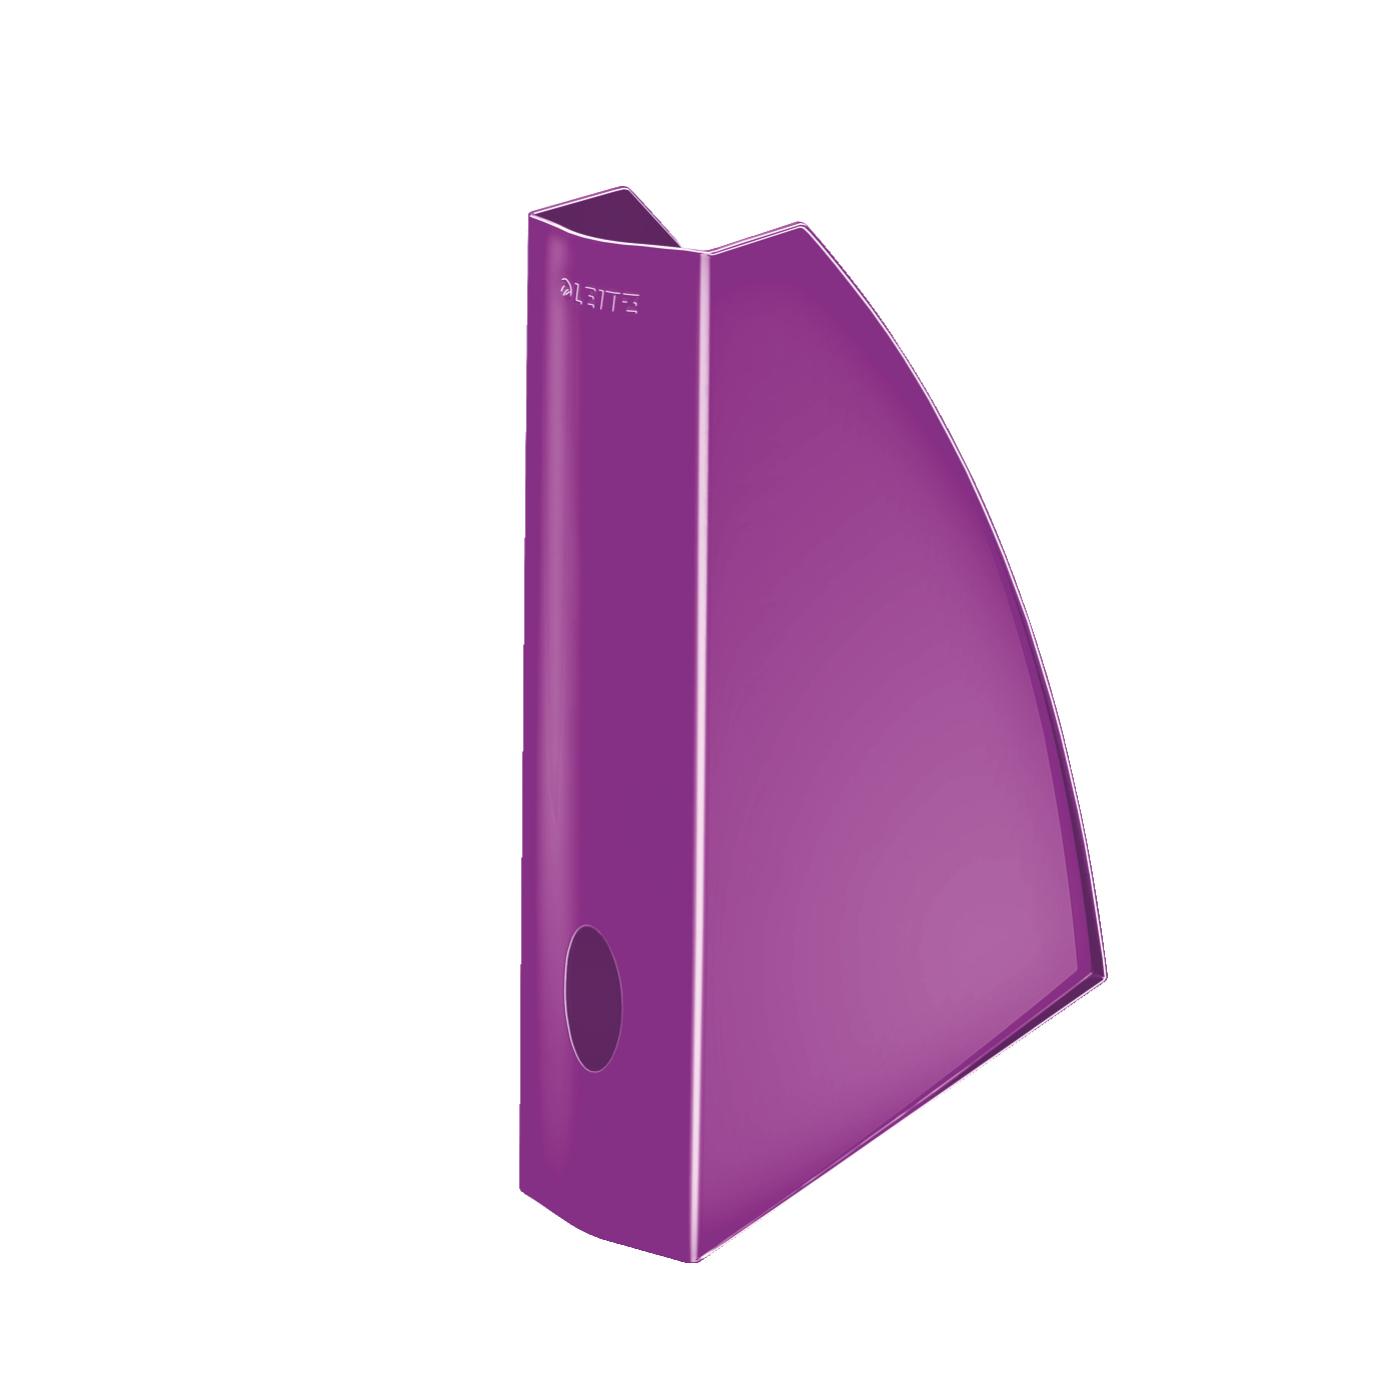 Leitz WOW Magazine File A4 Purple Ref 52771062